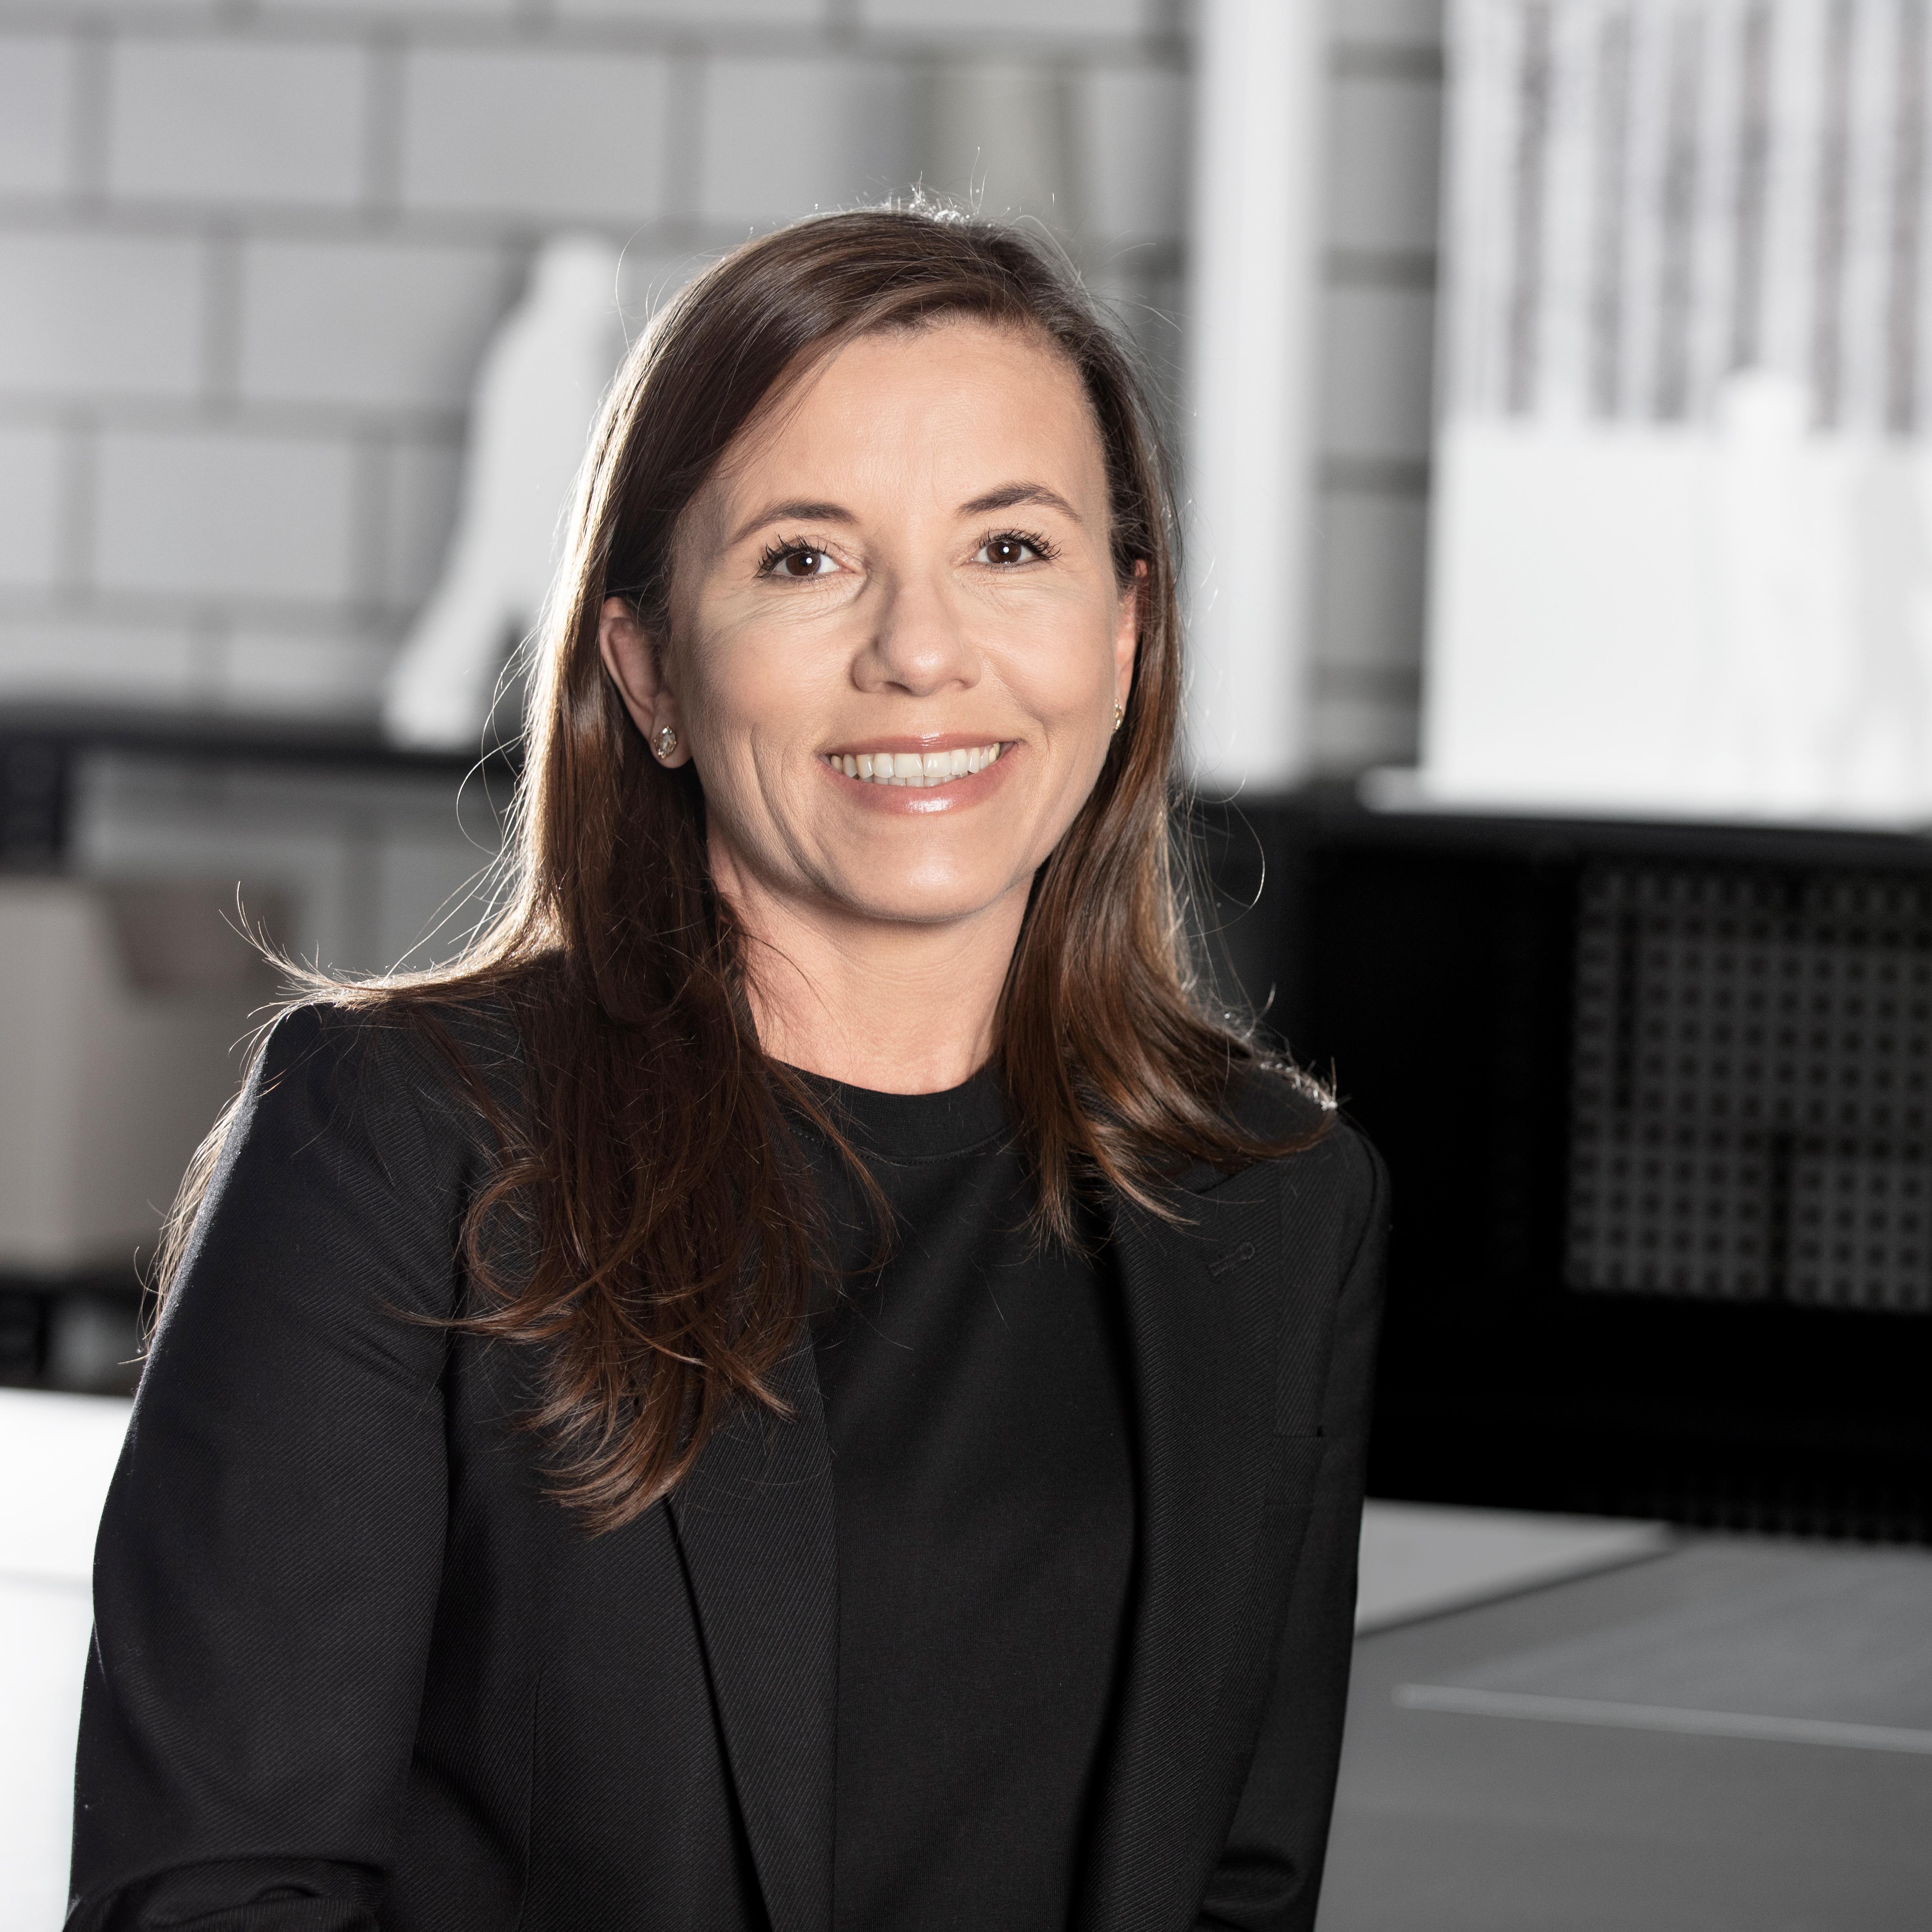 Cristina Vaucher Hauser